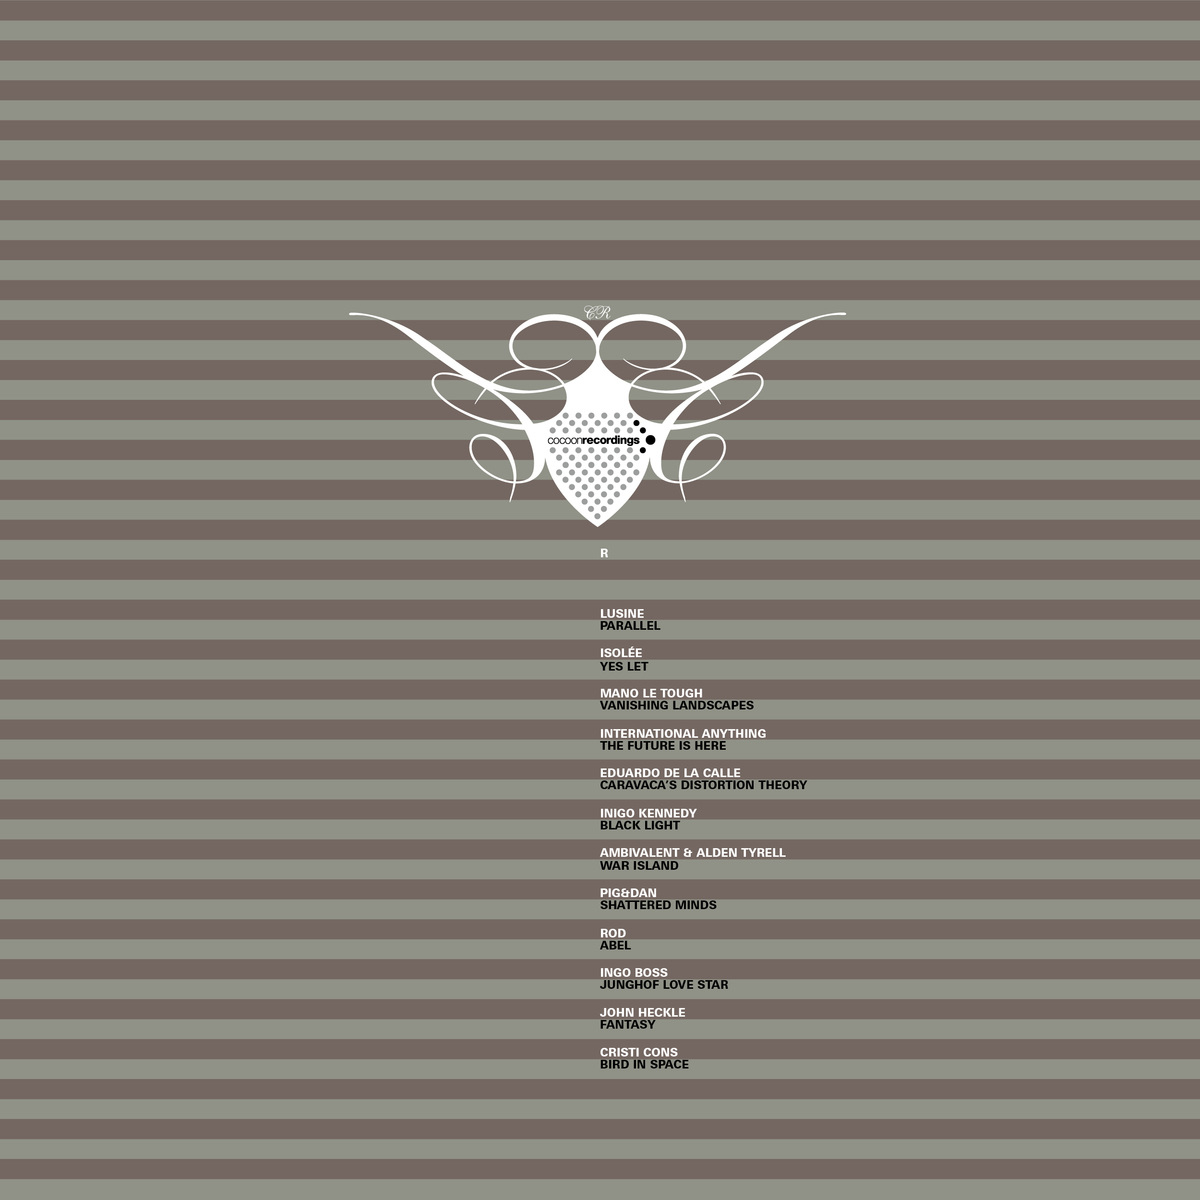 Isolée - Yes Let (Original Mix)